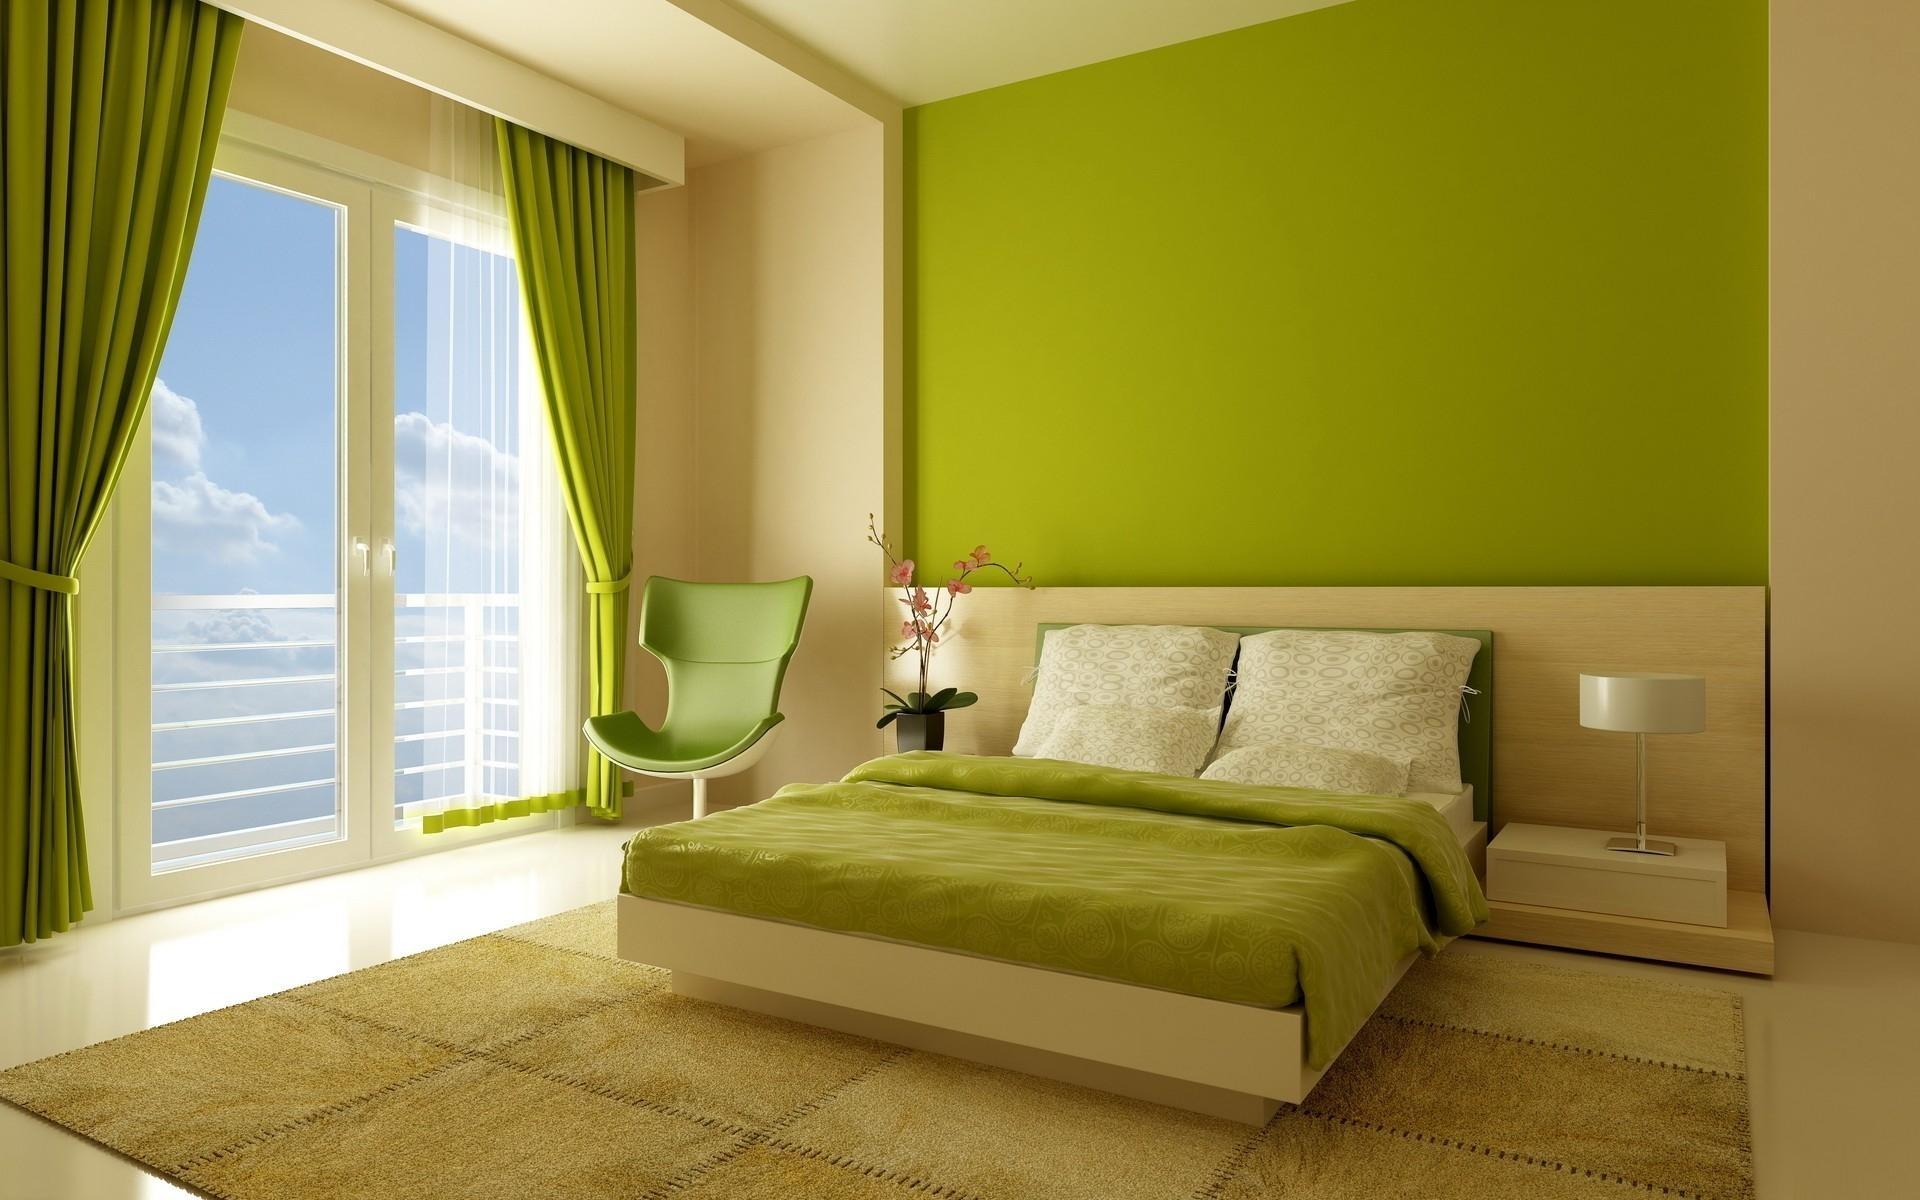 Bedroom Color Ideas - the Nuance of Choosing Tone - HomesFeed